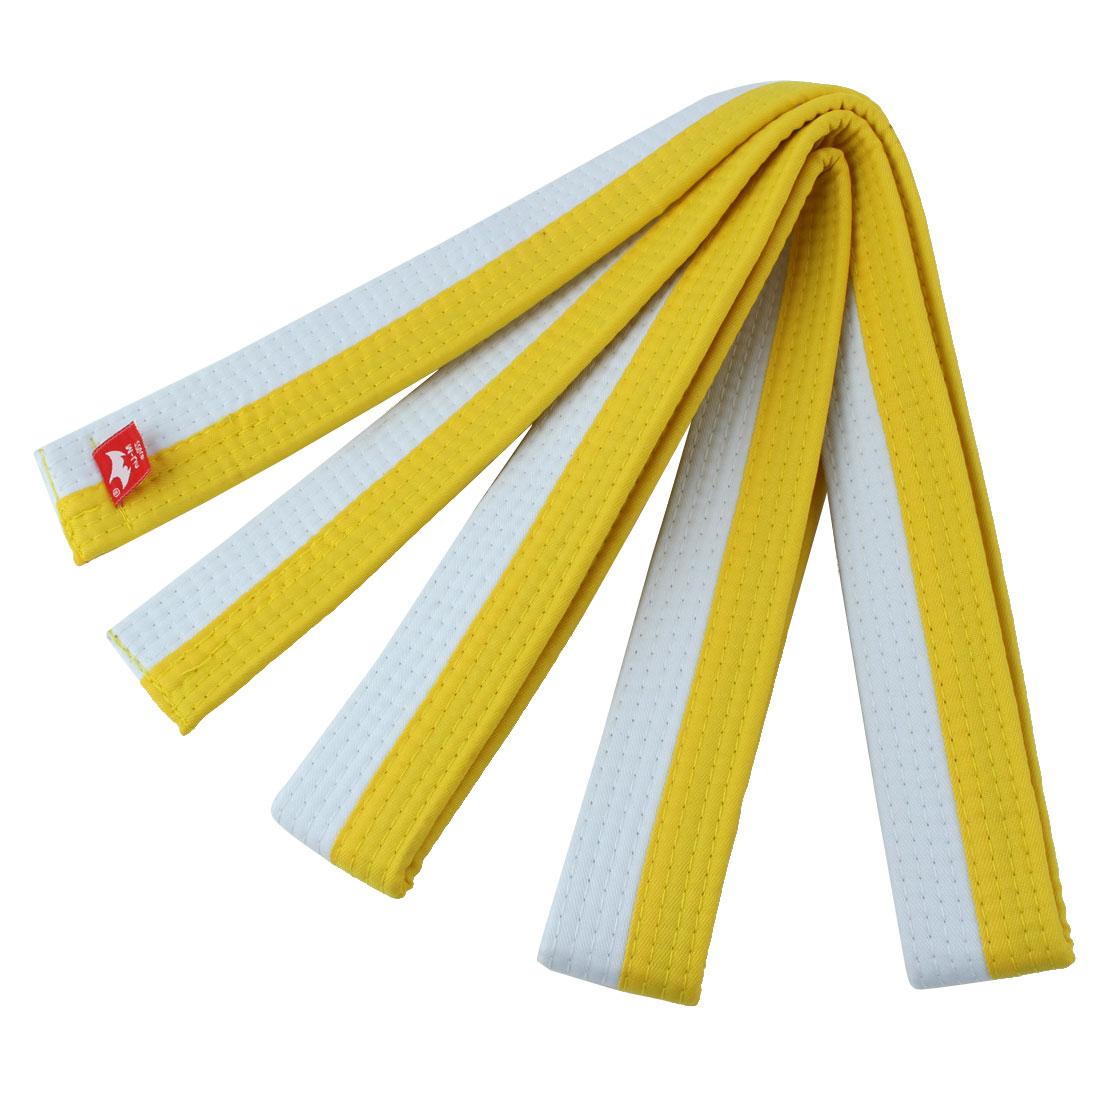 Taekwondo Cotton Blend Uniform Belt White Yellow 220cm Length